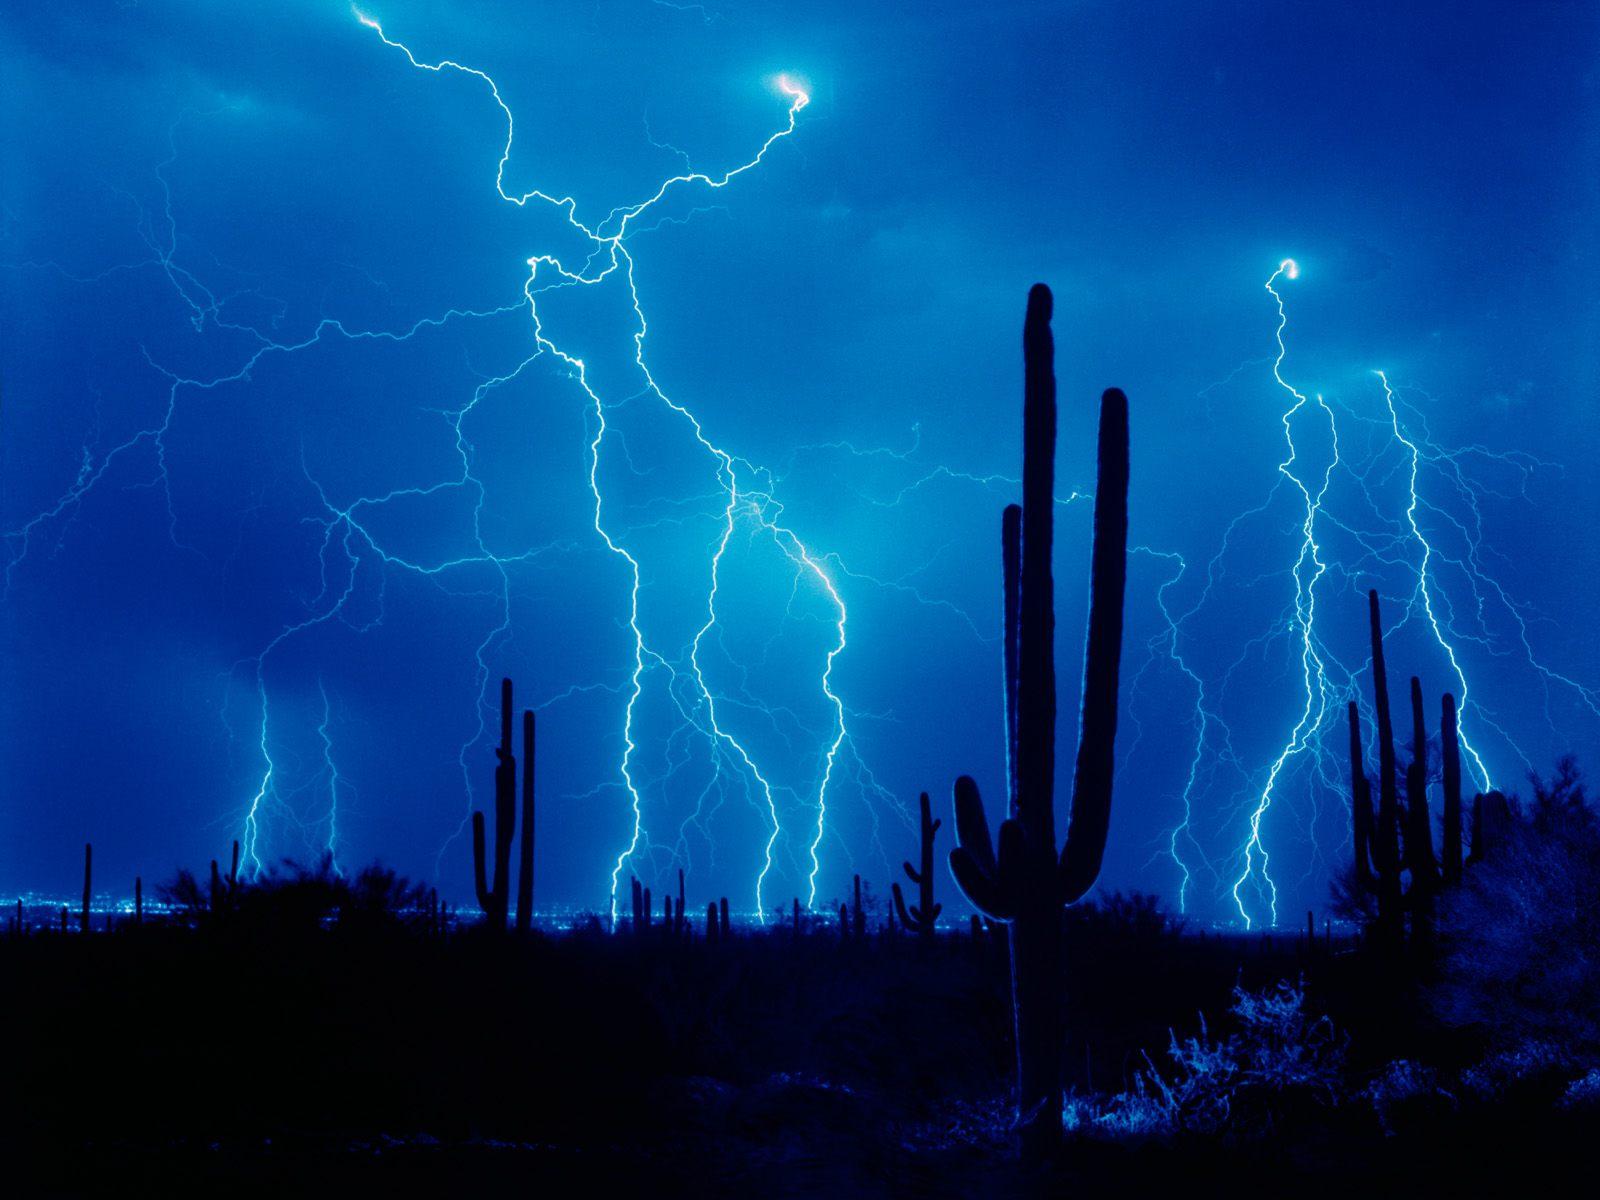 http://3.bp.blogspot.com/_f8JVwitI4kA/TP2uc9BOtfI/AAAAAAAABQc/n8iHokVSIcw/s1600/+Desktop+Wallpaper+%25C2%25B7+Gallery+%25C2%25B7+Nature+%250A+Desert+Strike.jpeg